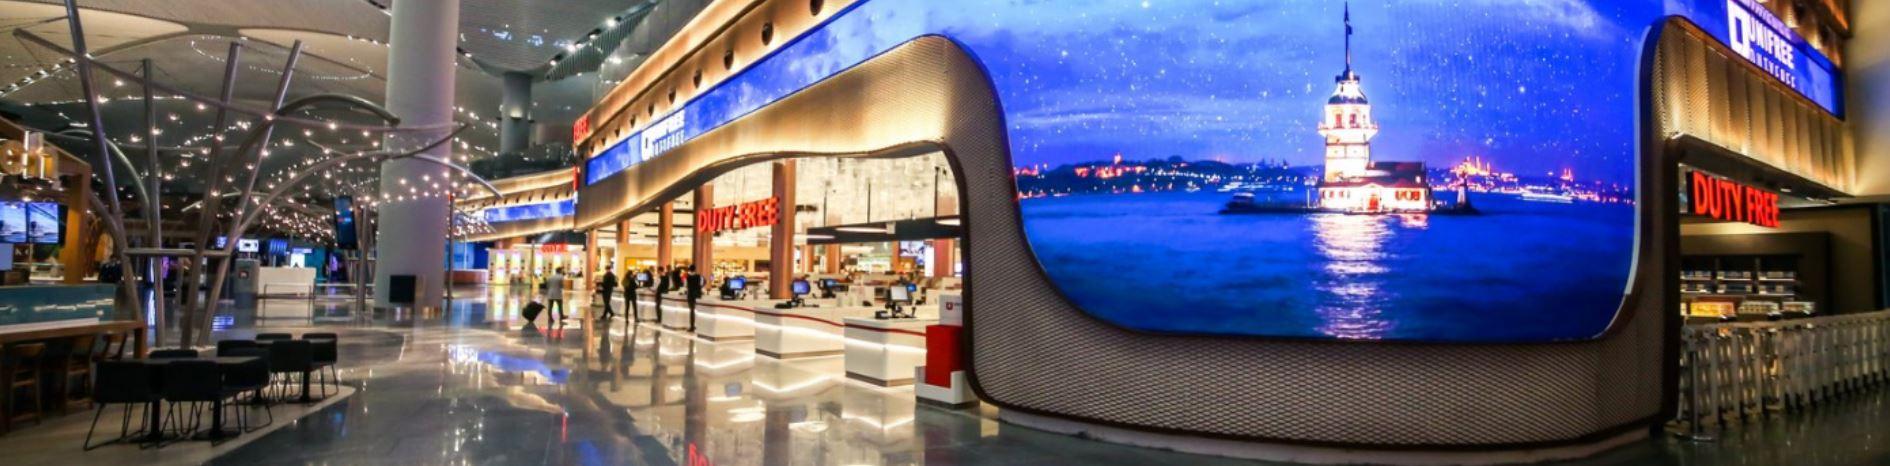 How Brands Like Shisheido Create Immersive Airport Retail Experiences | PSFK